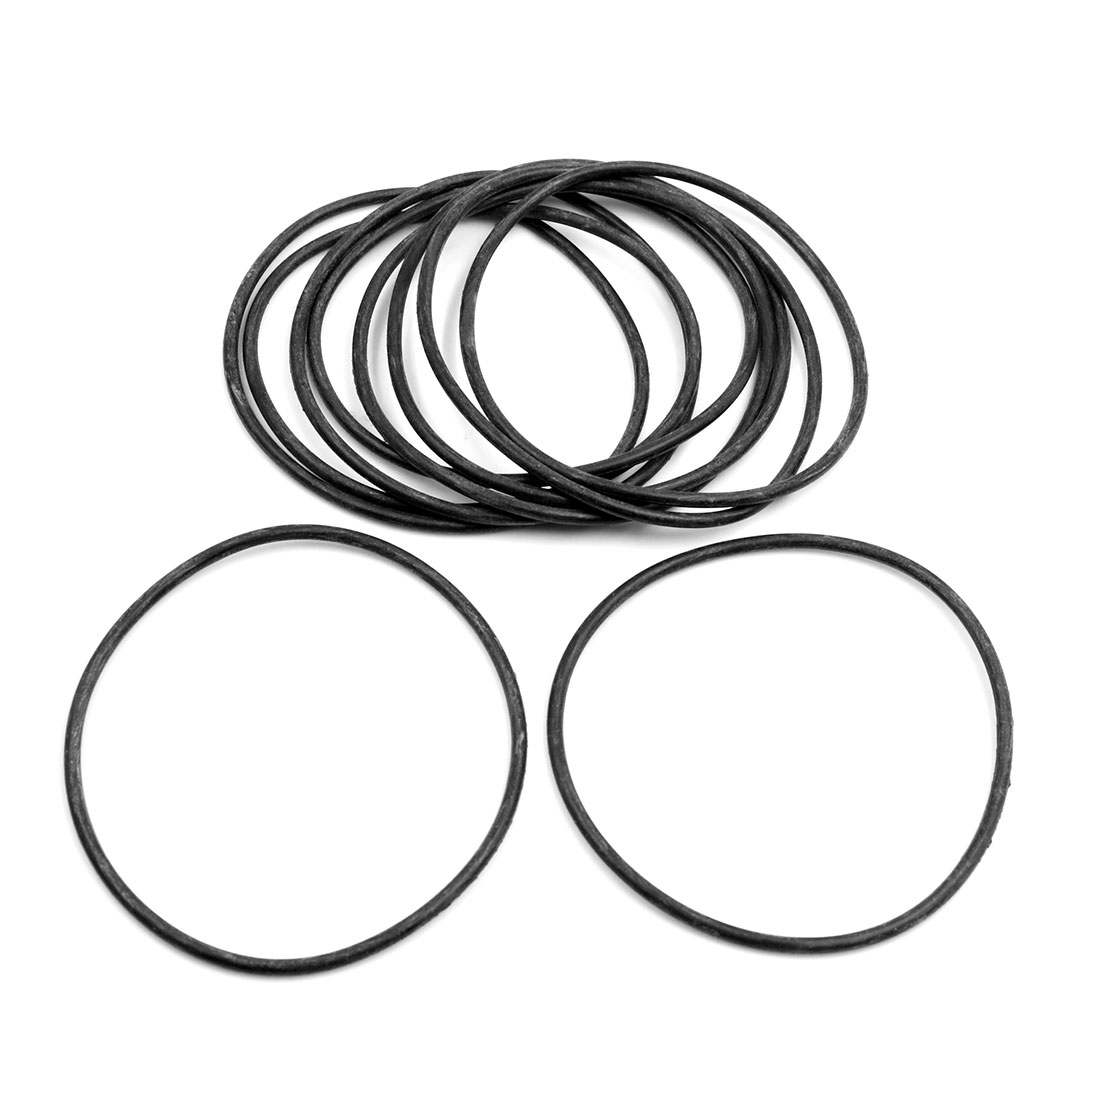 10pcs Black Universal Nitrile Rubber O-Ring Seals Gasket for Car 97.5 x 3.55mm